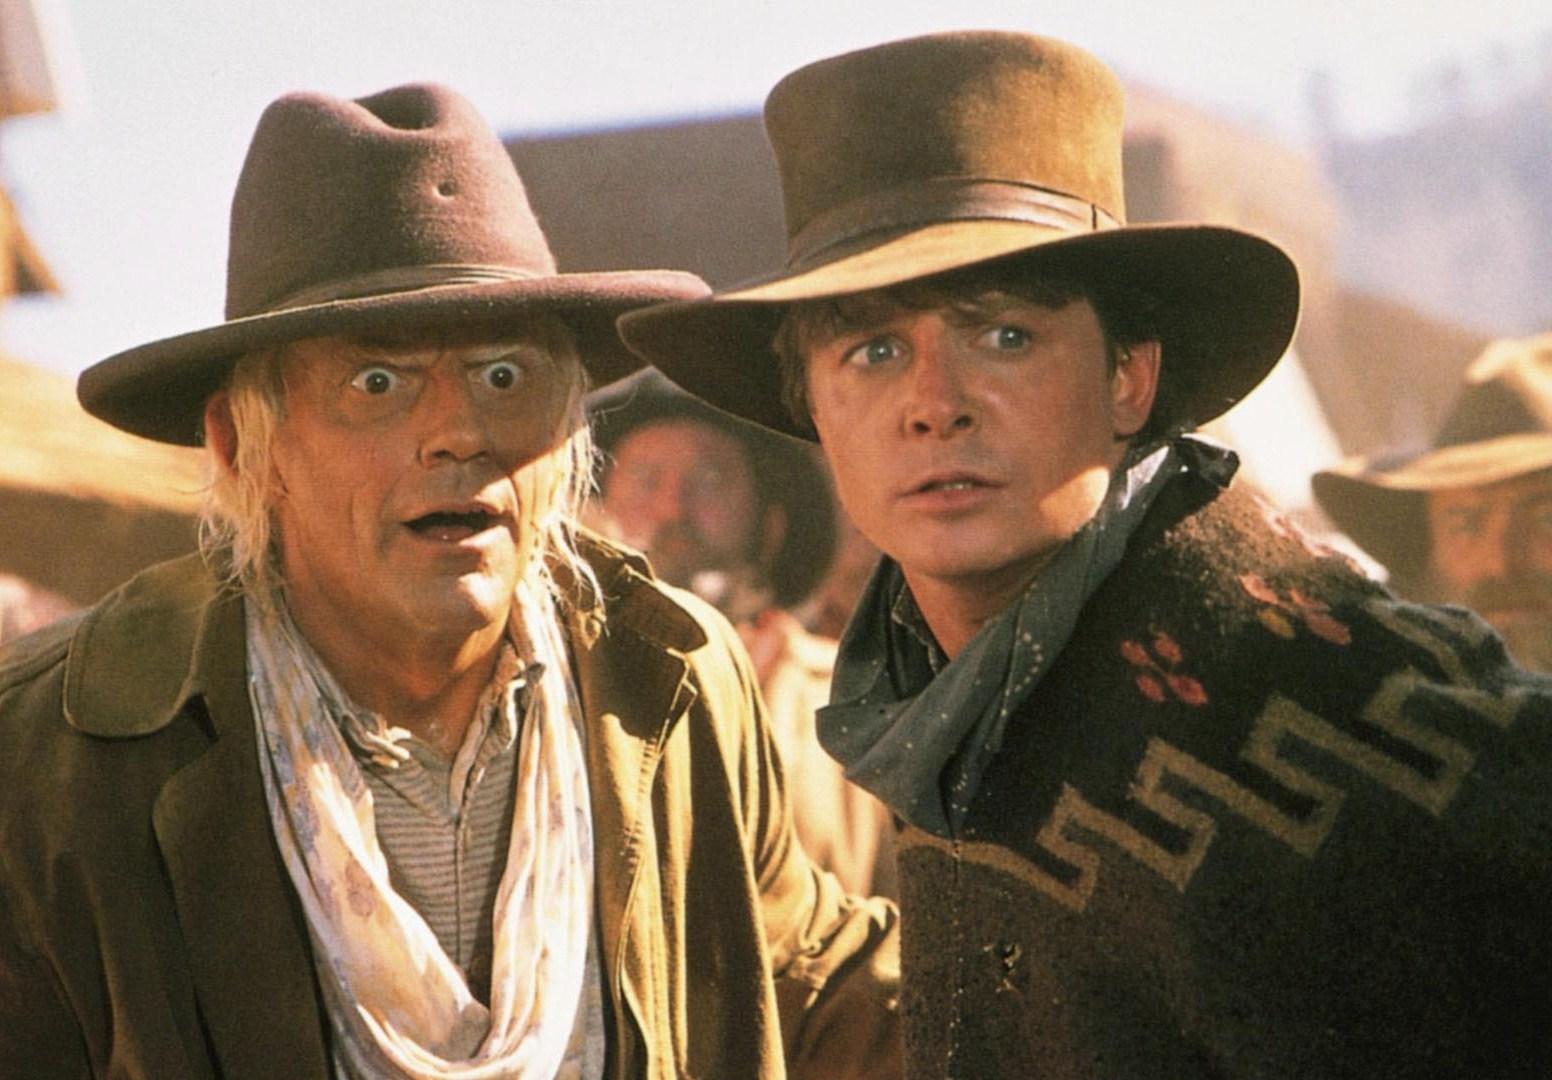 Christopher Lloyd shows Michael J. Fox how he did the Judge Doom pop-eyes effect.